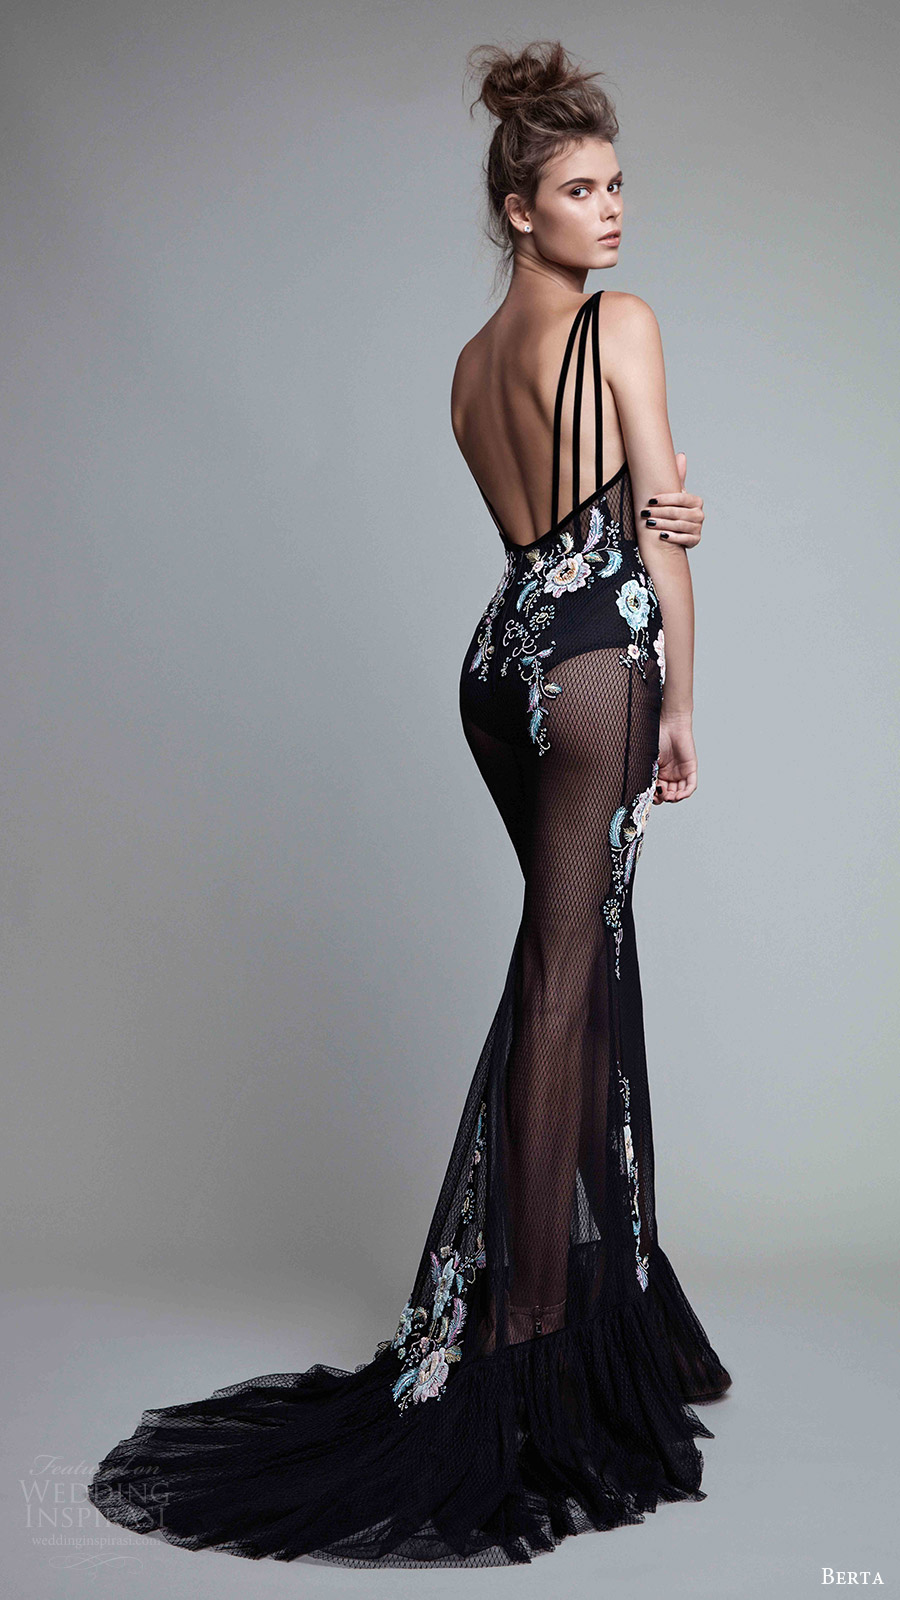 berta rtw fall 2017 (17 22) sleeveless deep v neck embroidered black trumpet evening dress bv sheer skirt train